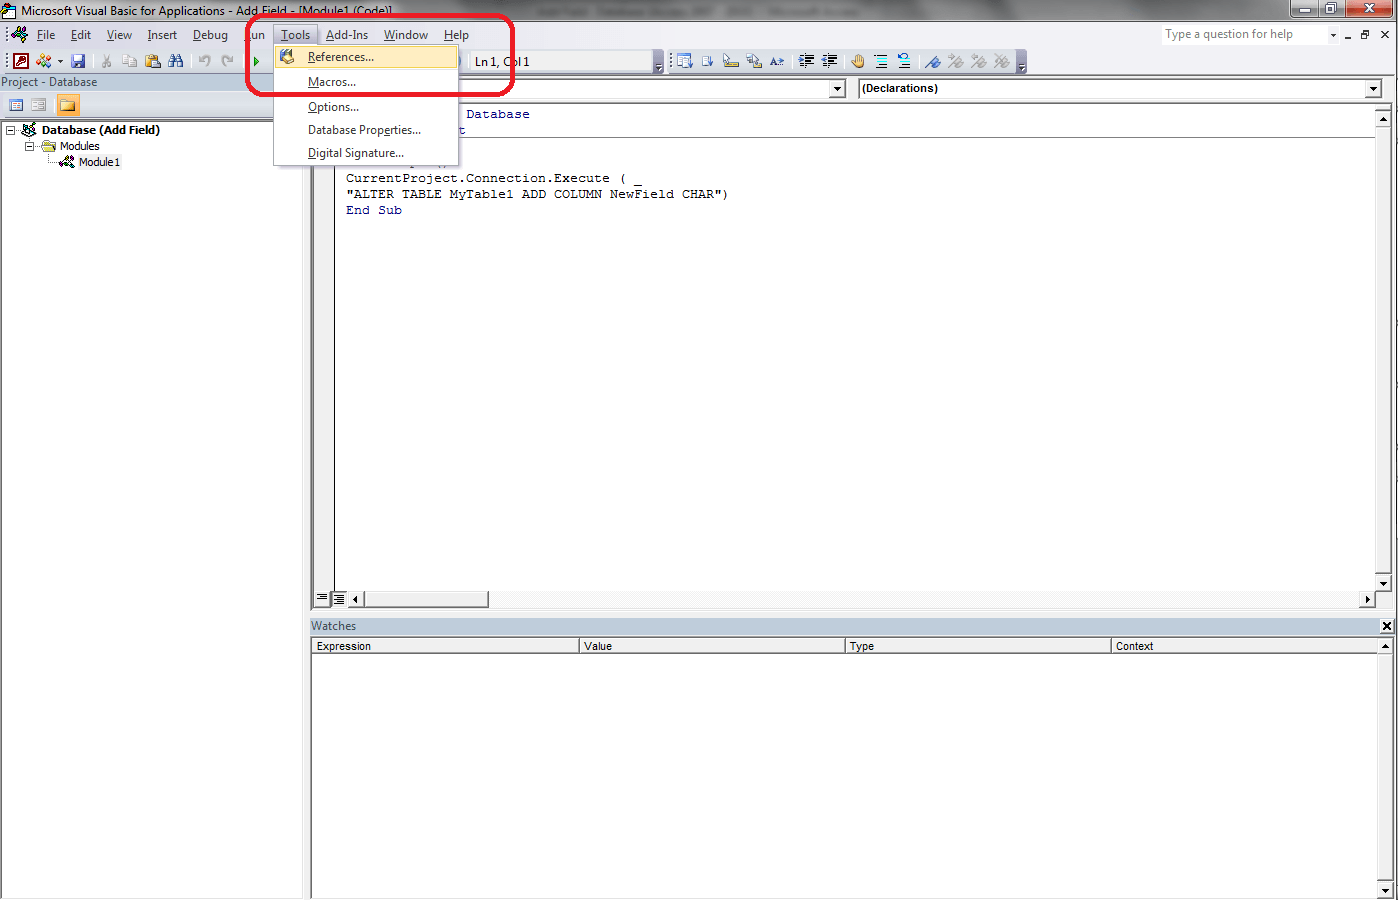 VBA Access Object Library - VBA and VB Net Tutorials